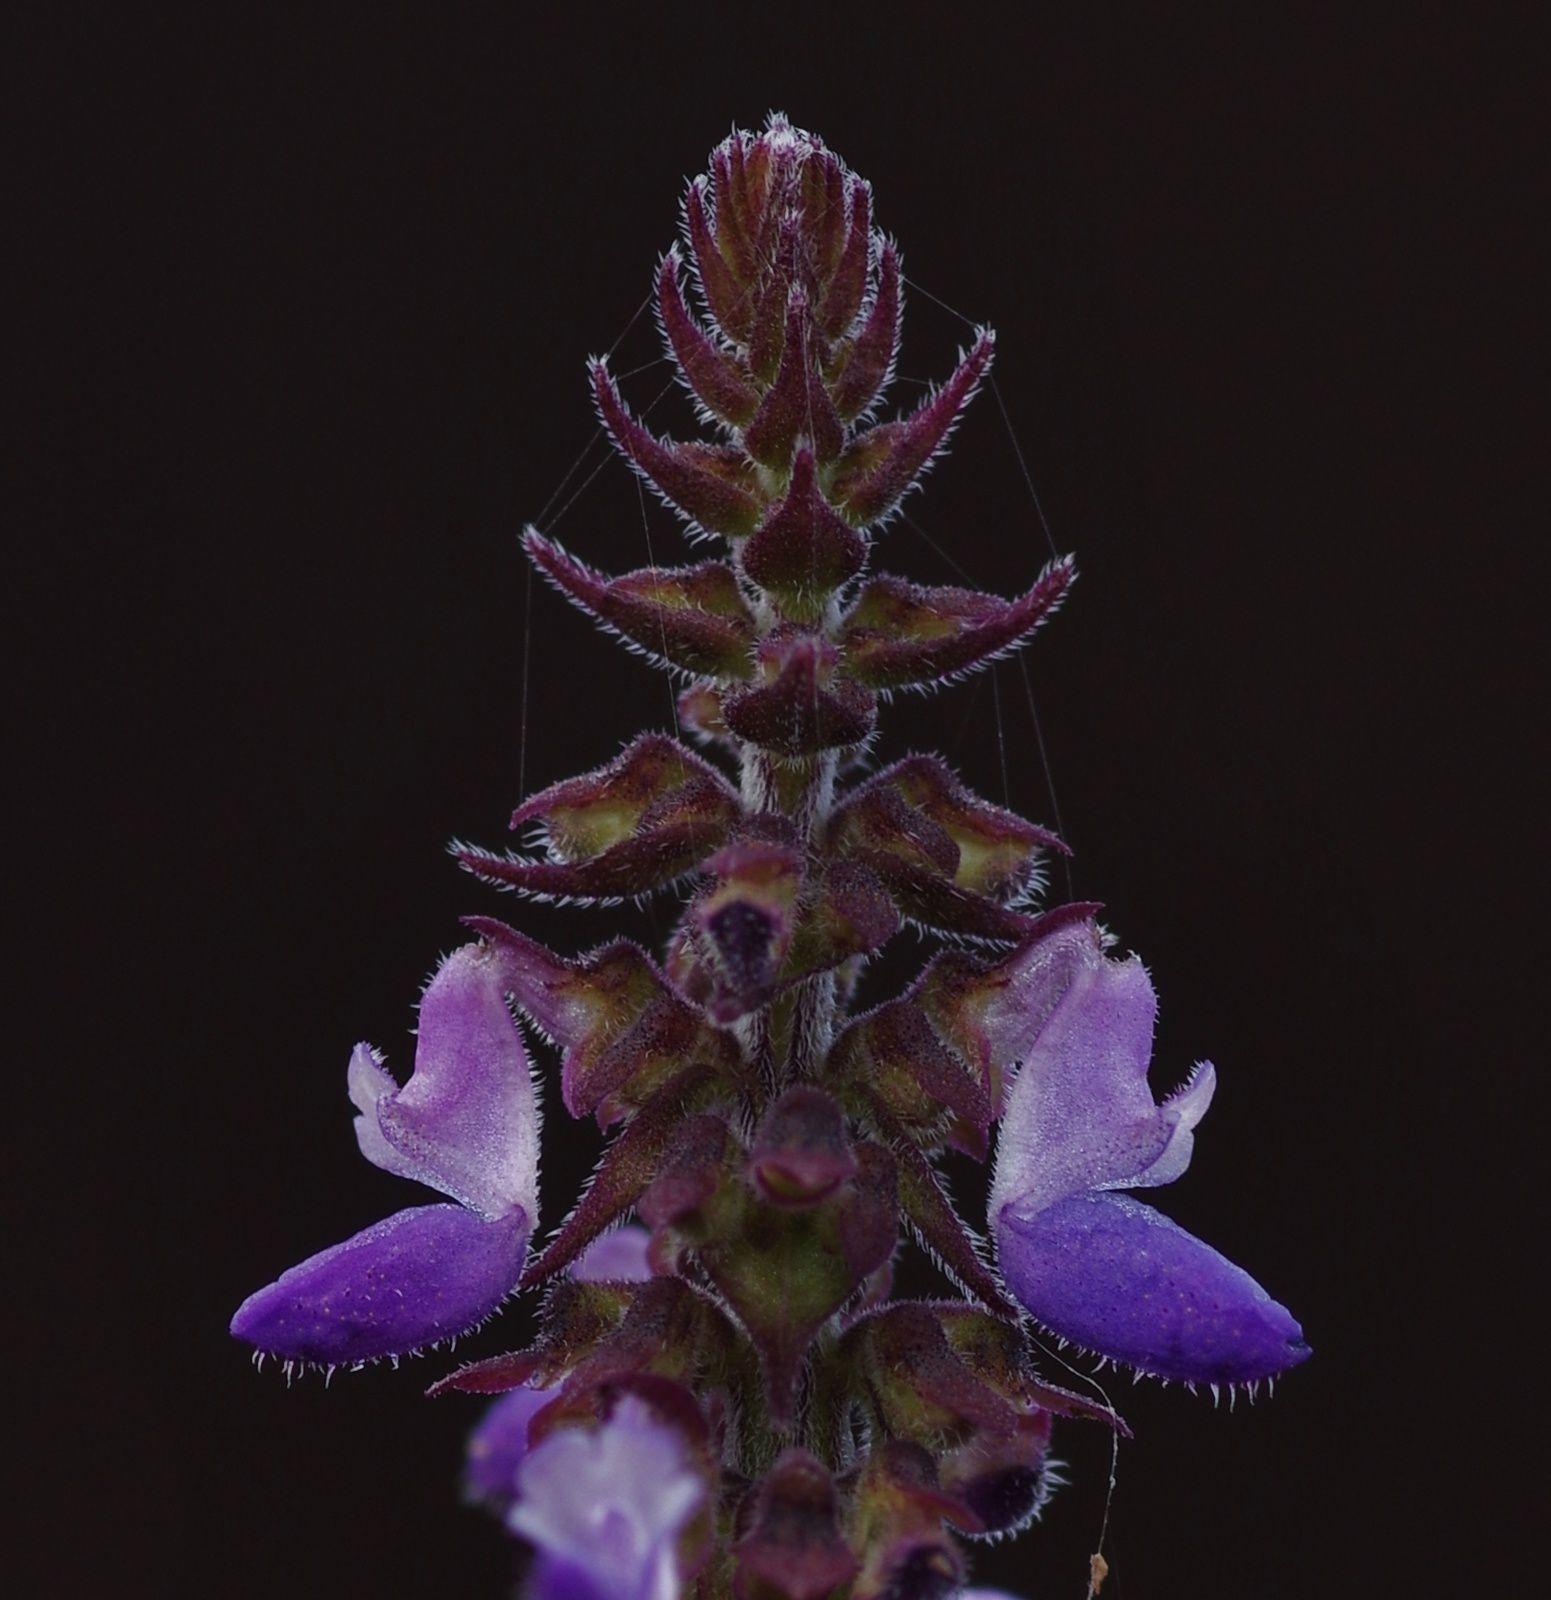 Plectranthus monostachyus